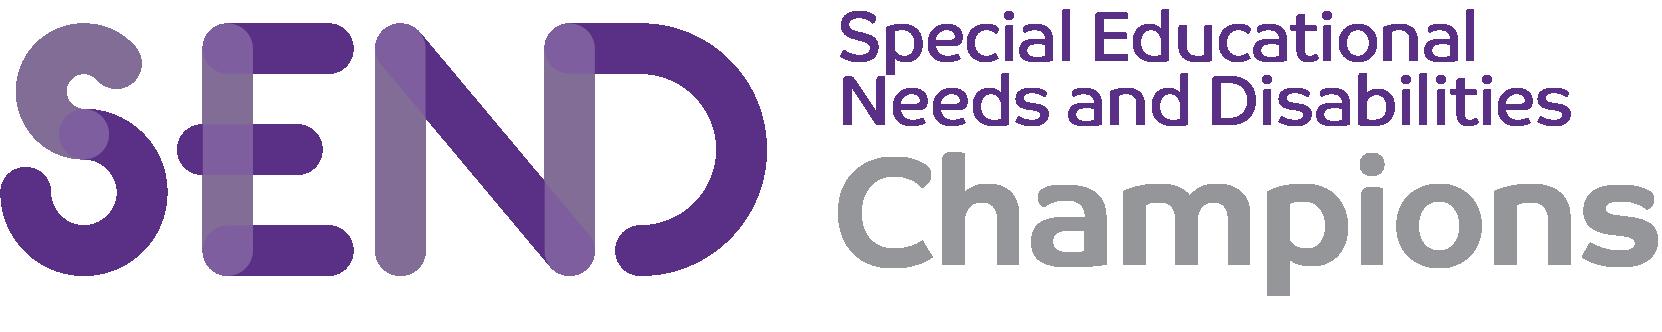 SEND champions logo